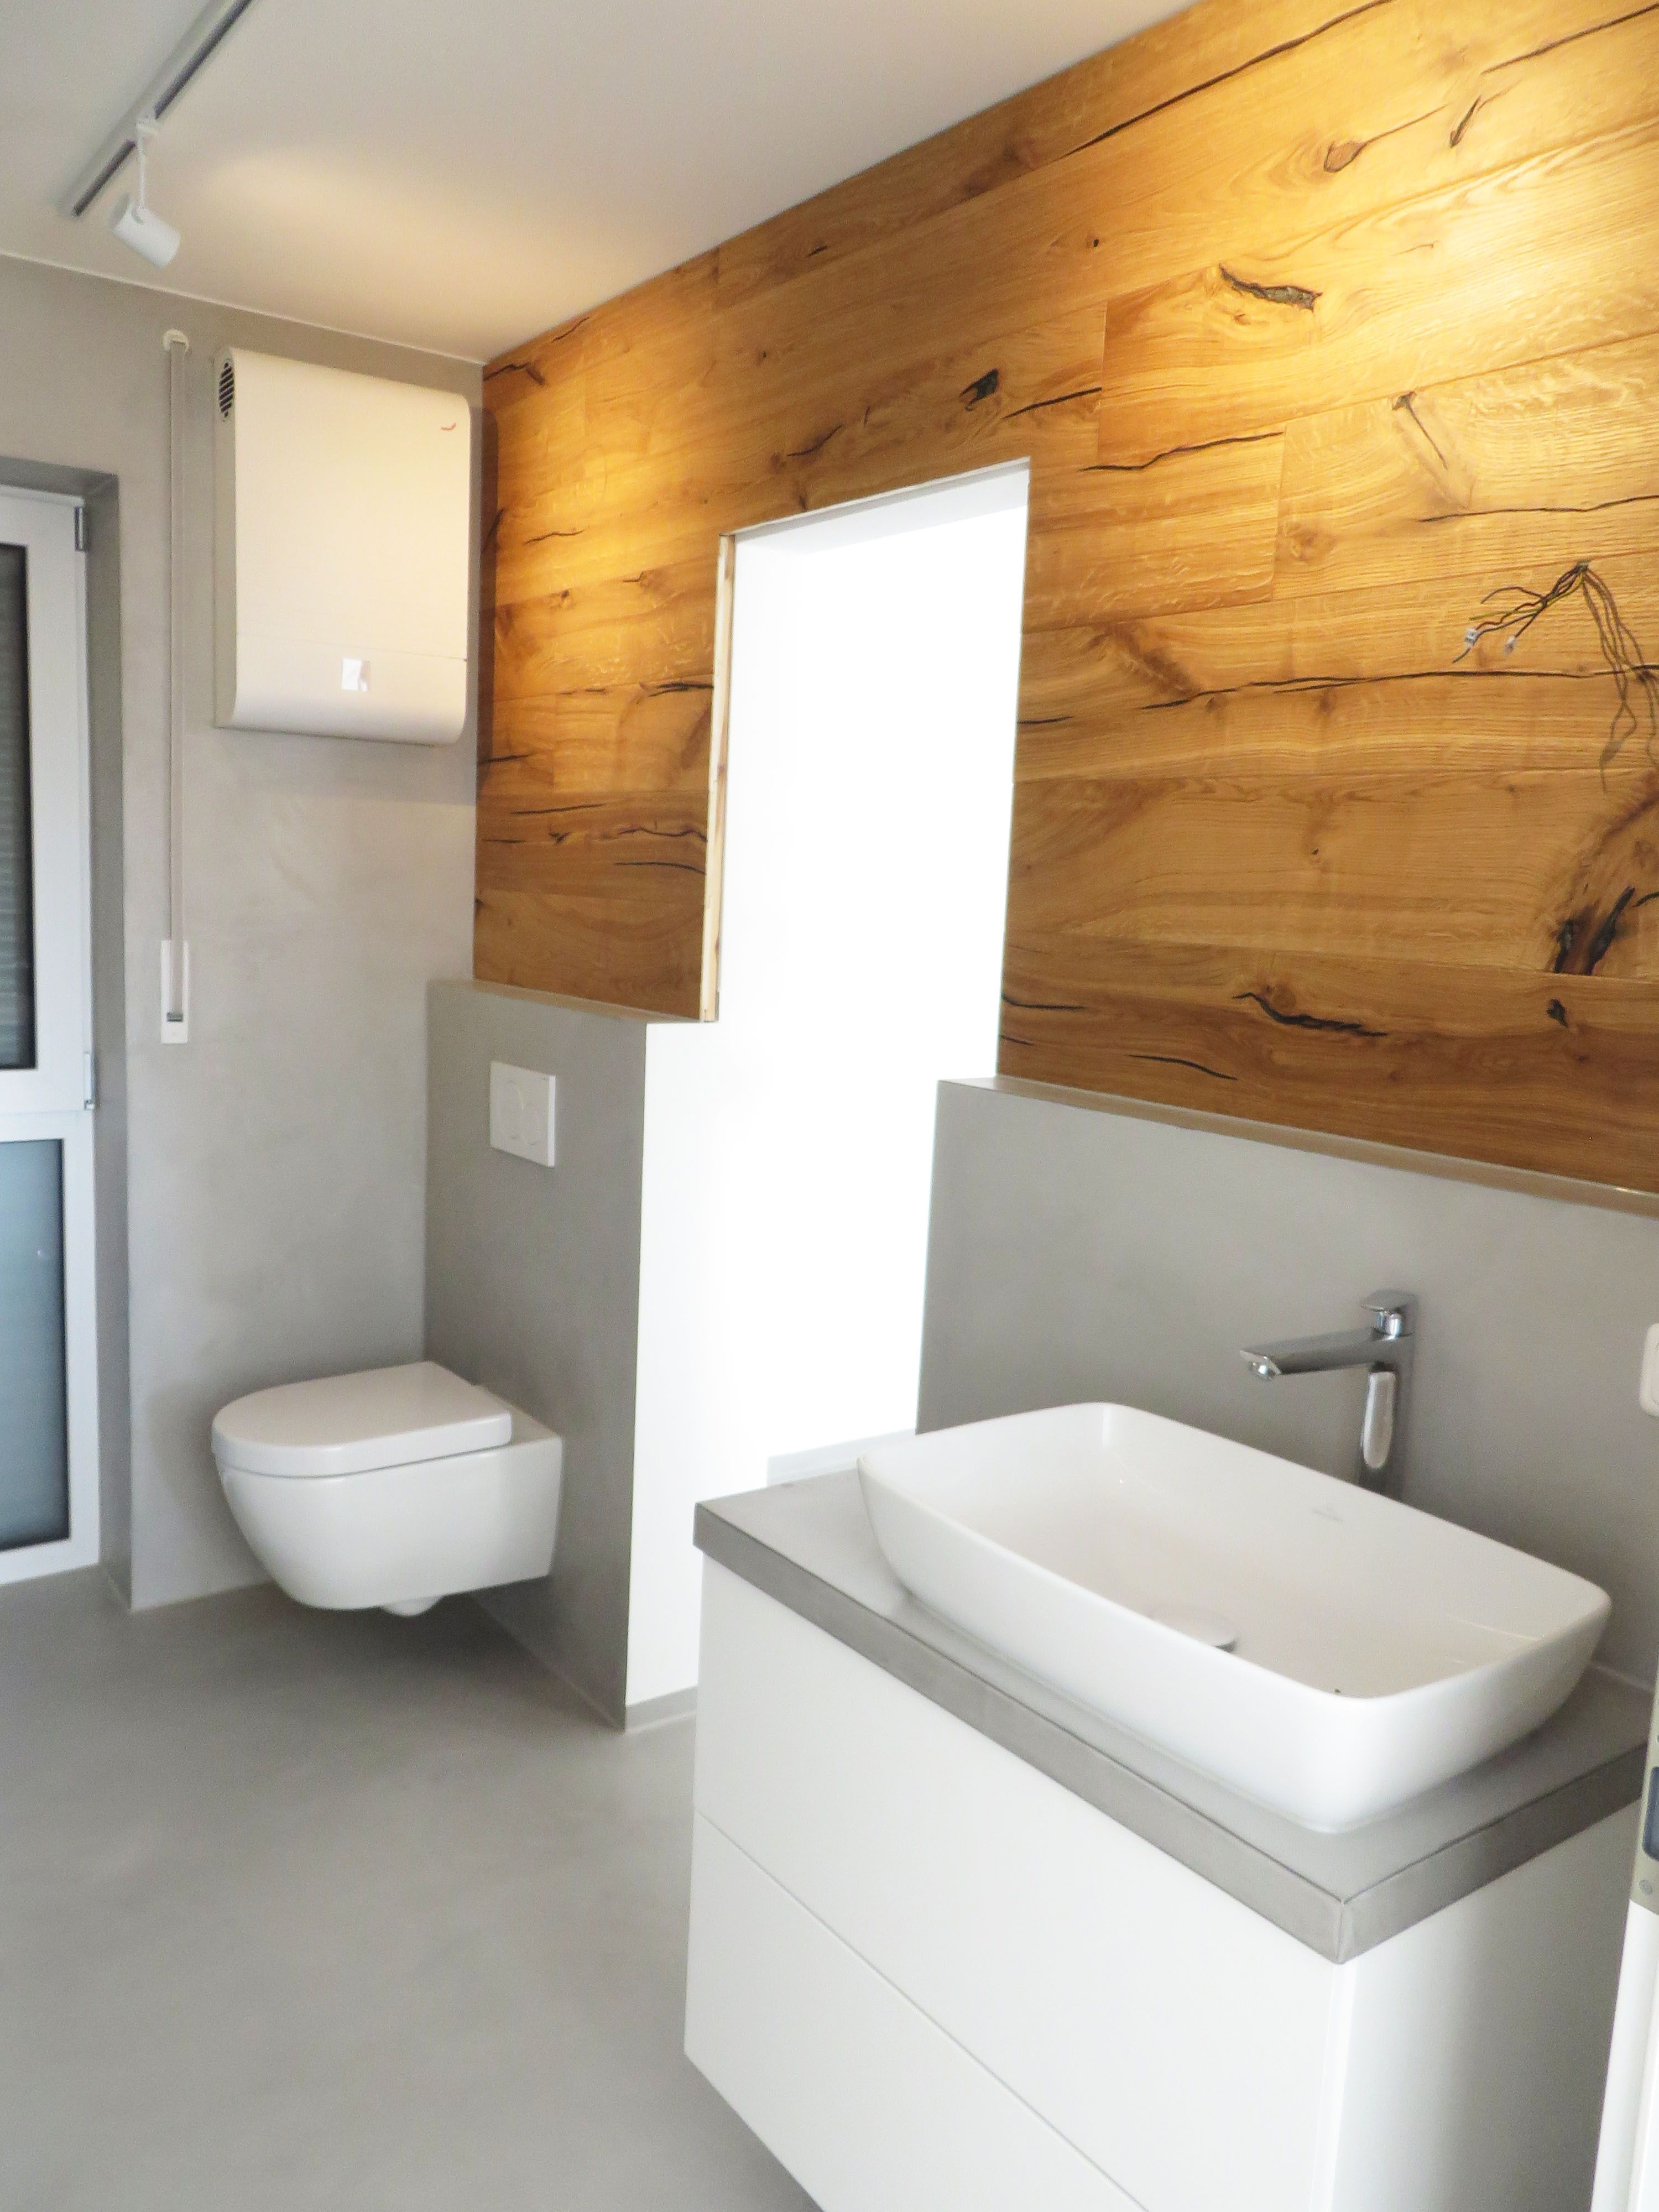 Bad Beton Und Holz By Fugenlos Modern De Fugenloses Bad Bad Grundriss Neues Badezimmer